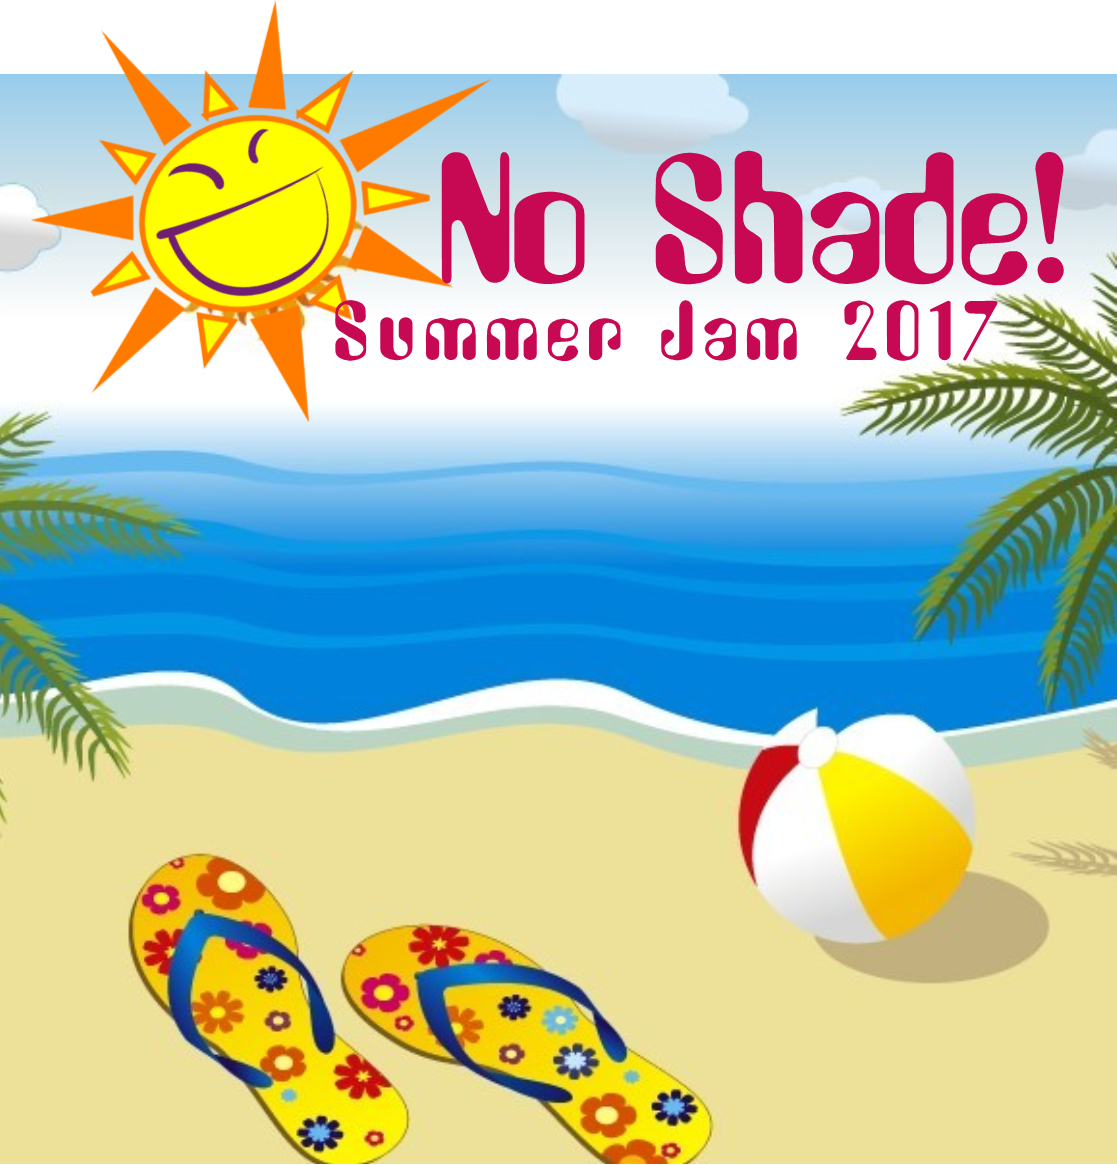 No Shade!  Summer Jam 2017 General Admission Tickets 00001